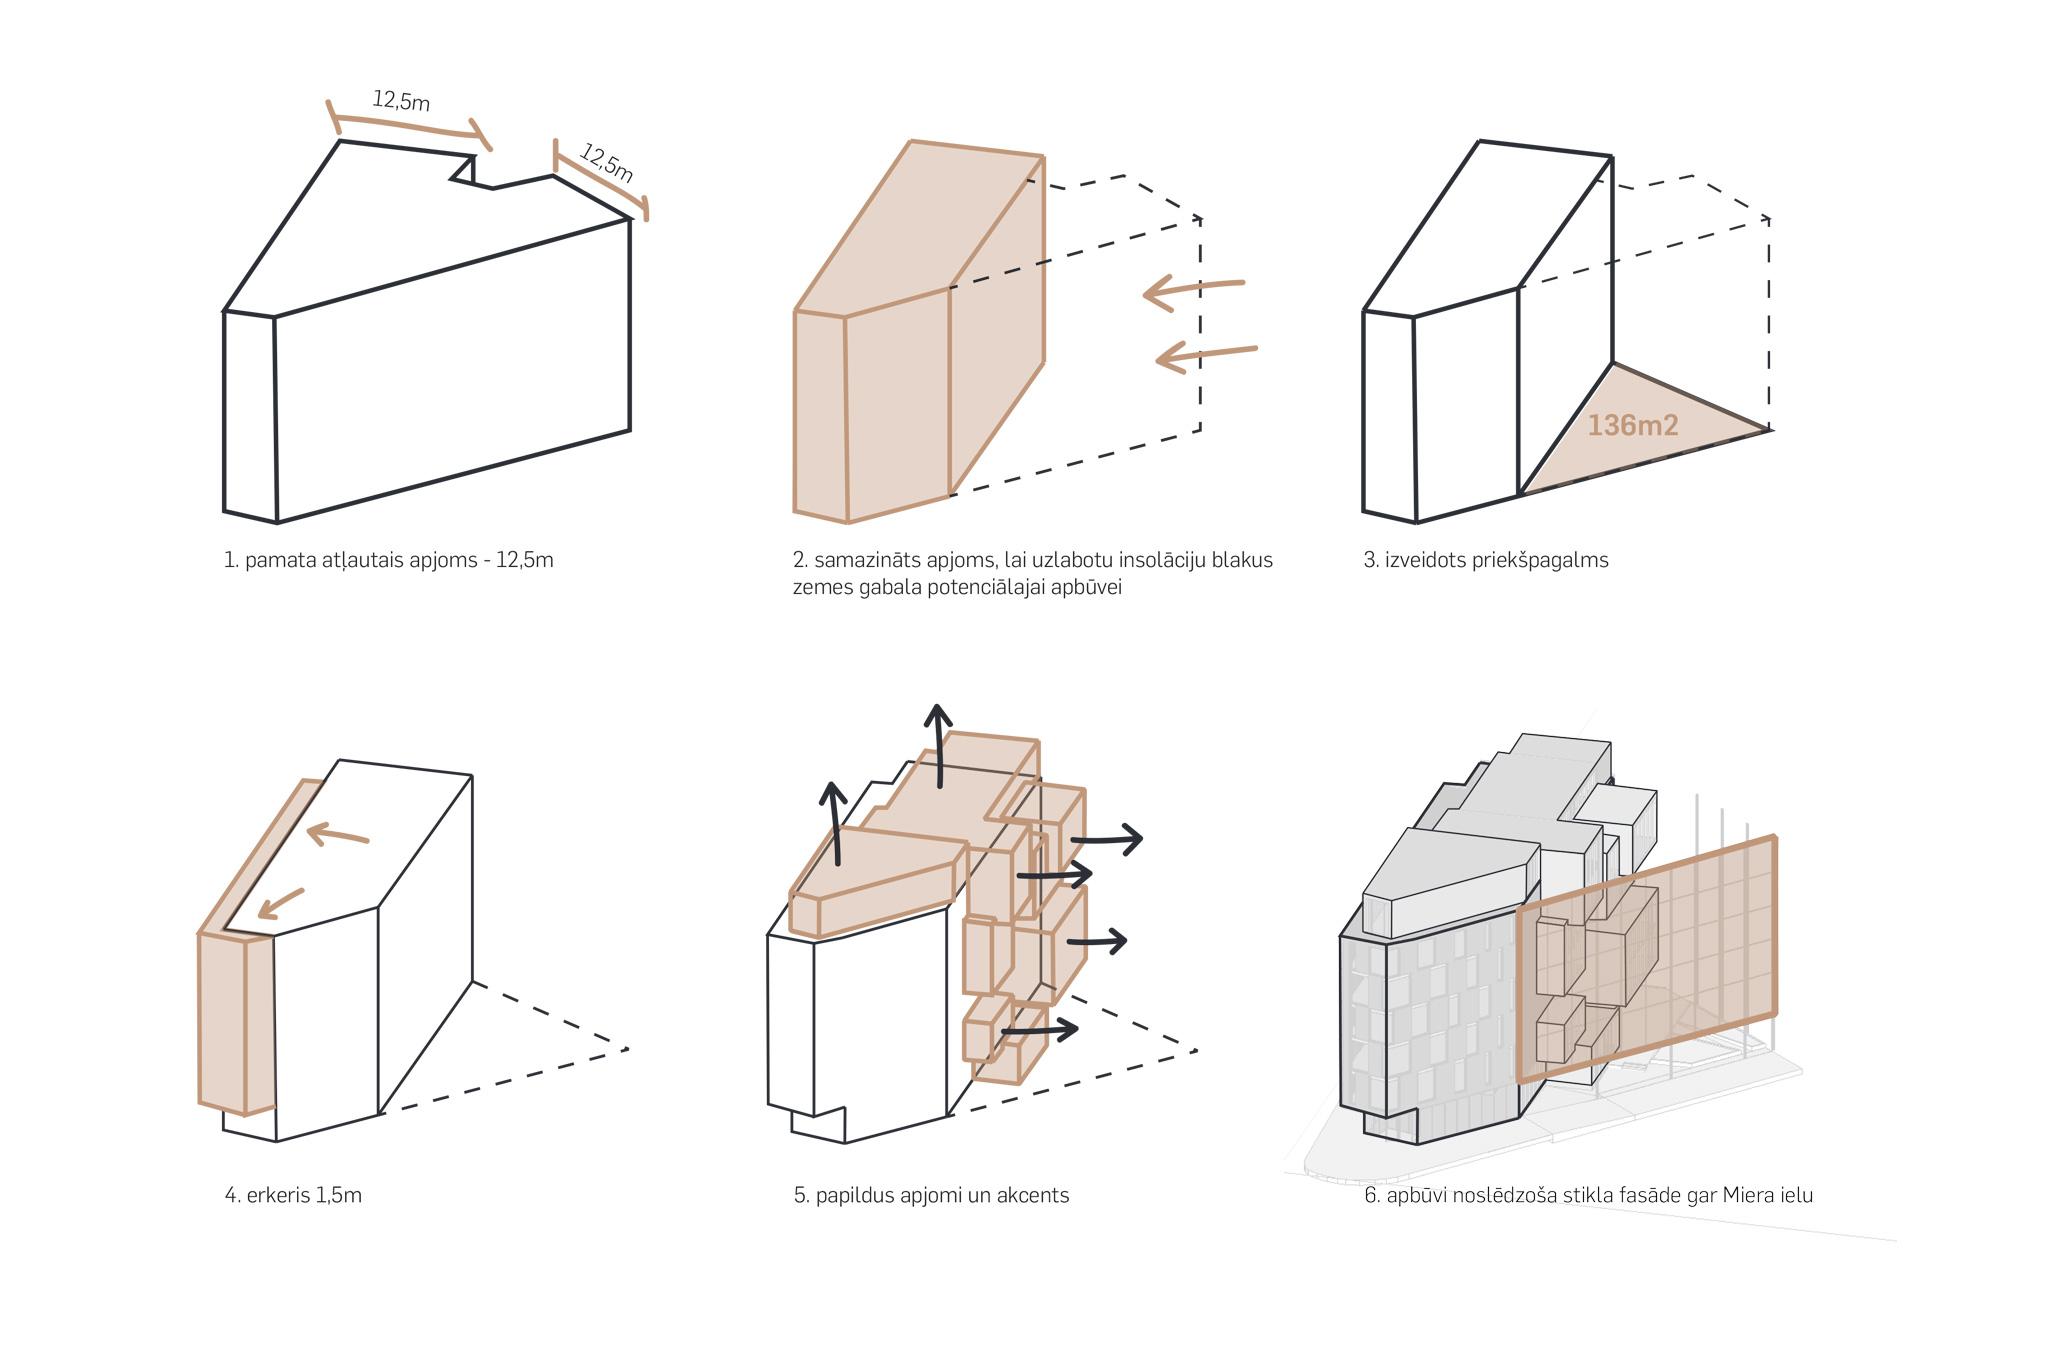 diagramma_apjomi